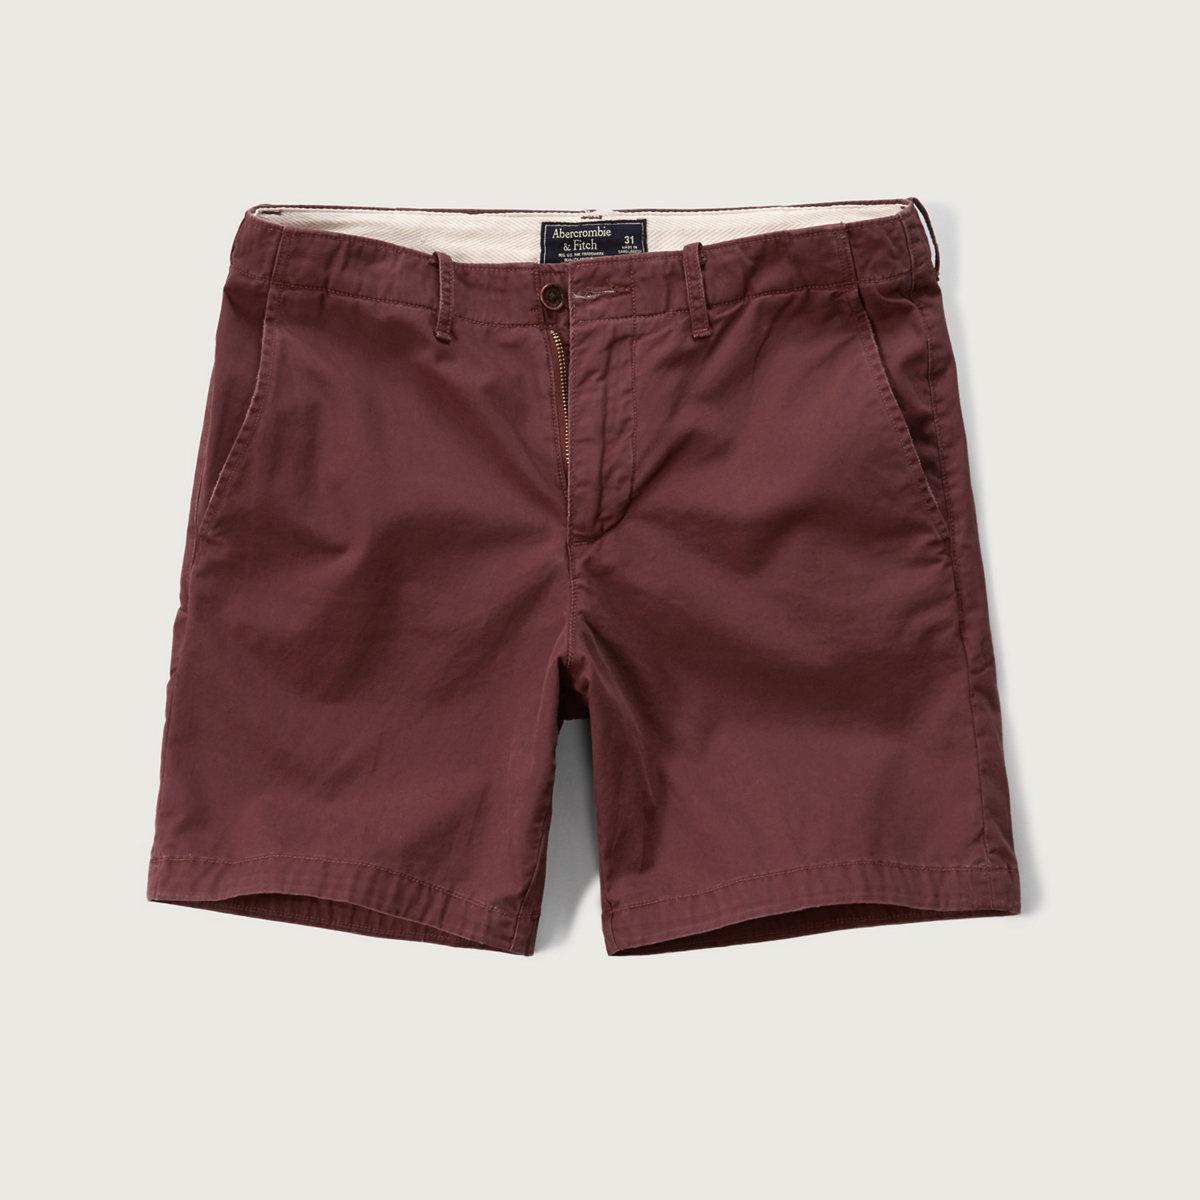 A&F Preppy Fit Shorts